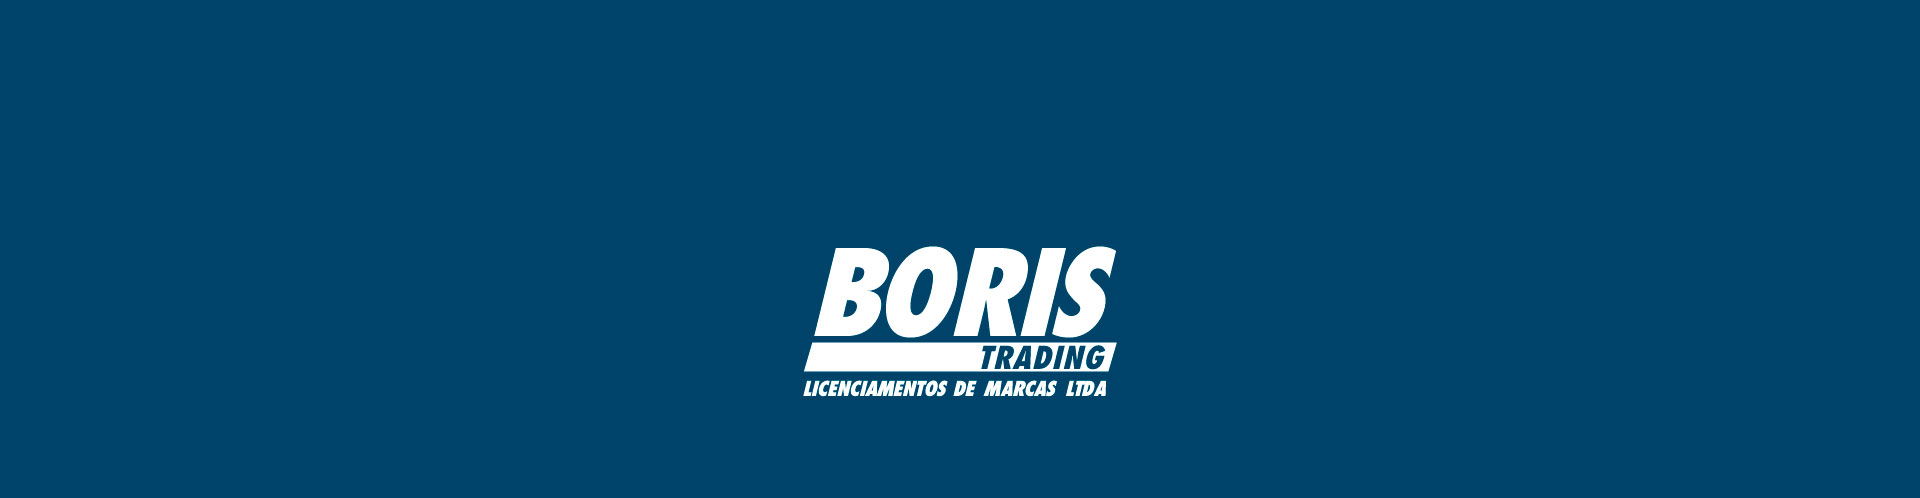 fd17049f7f8bd boris-trading - Óticas Boris